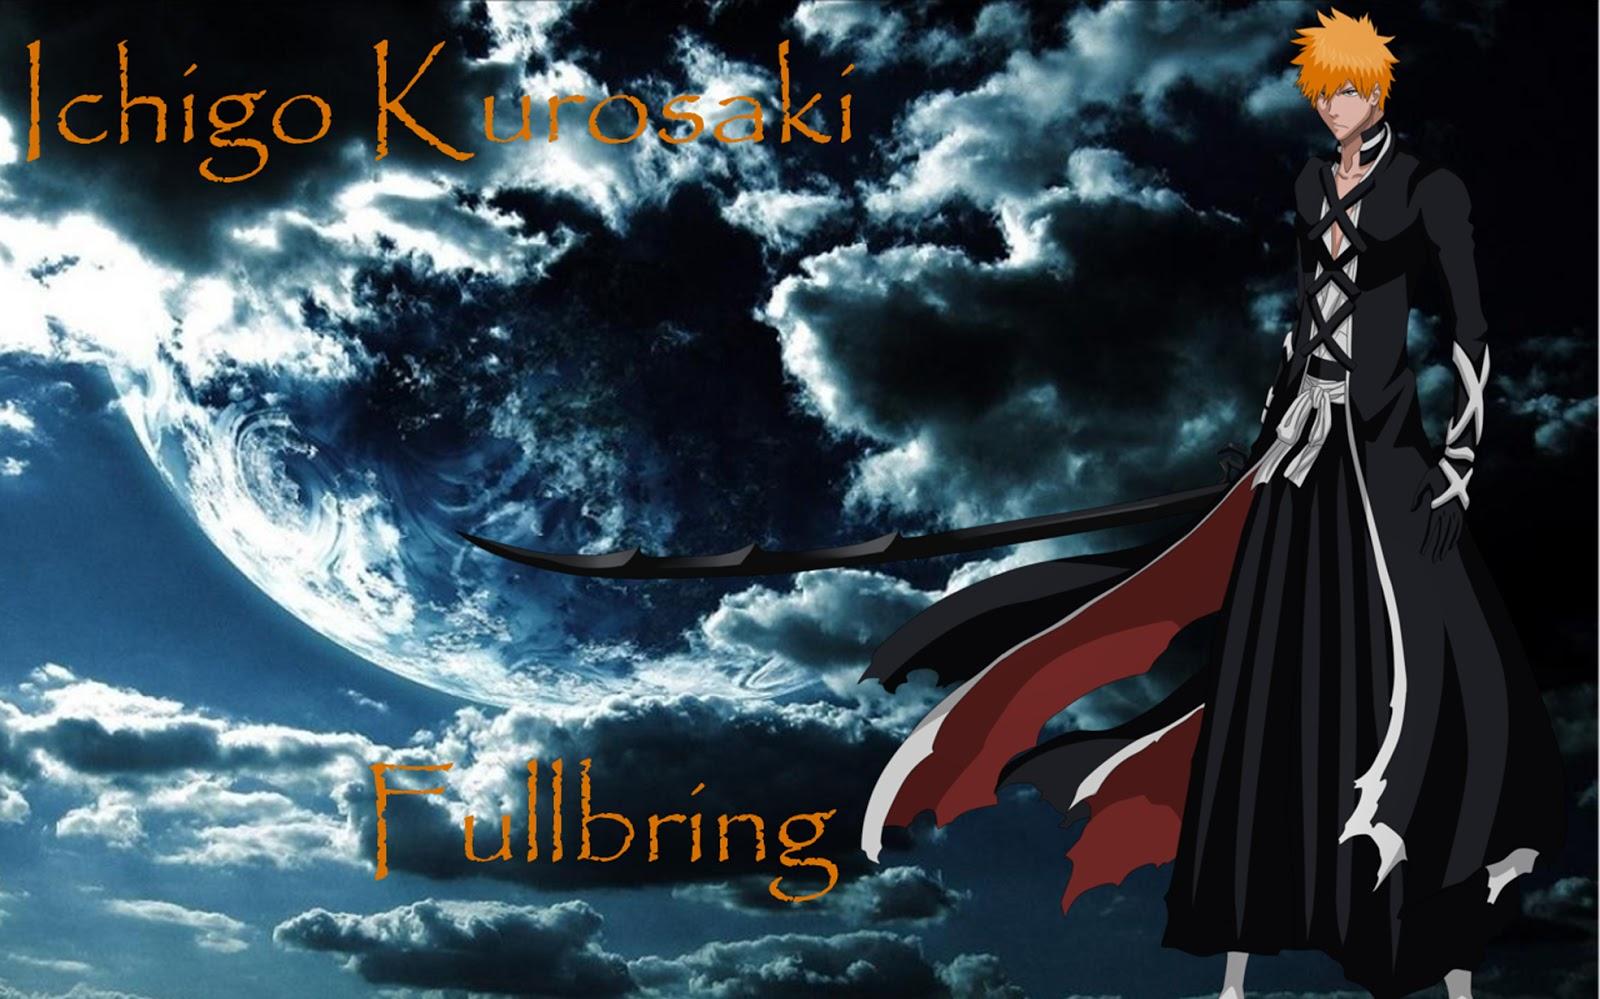 http://3.bp.blogspot.com/-lL8SGA202Fo/URZc81vfdpI/AAAAAAAABFU/OHAj7itIccI/s1600/Ichigo+Kurosaki+Wallpaper+7+.jpg